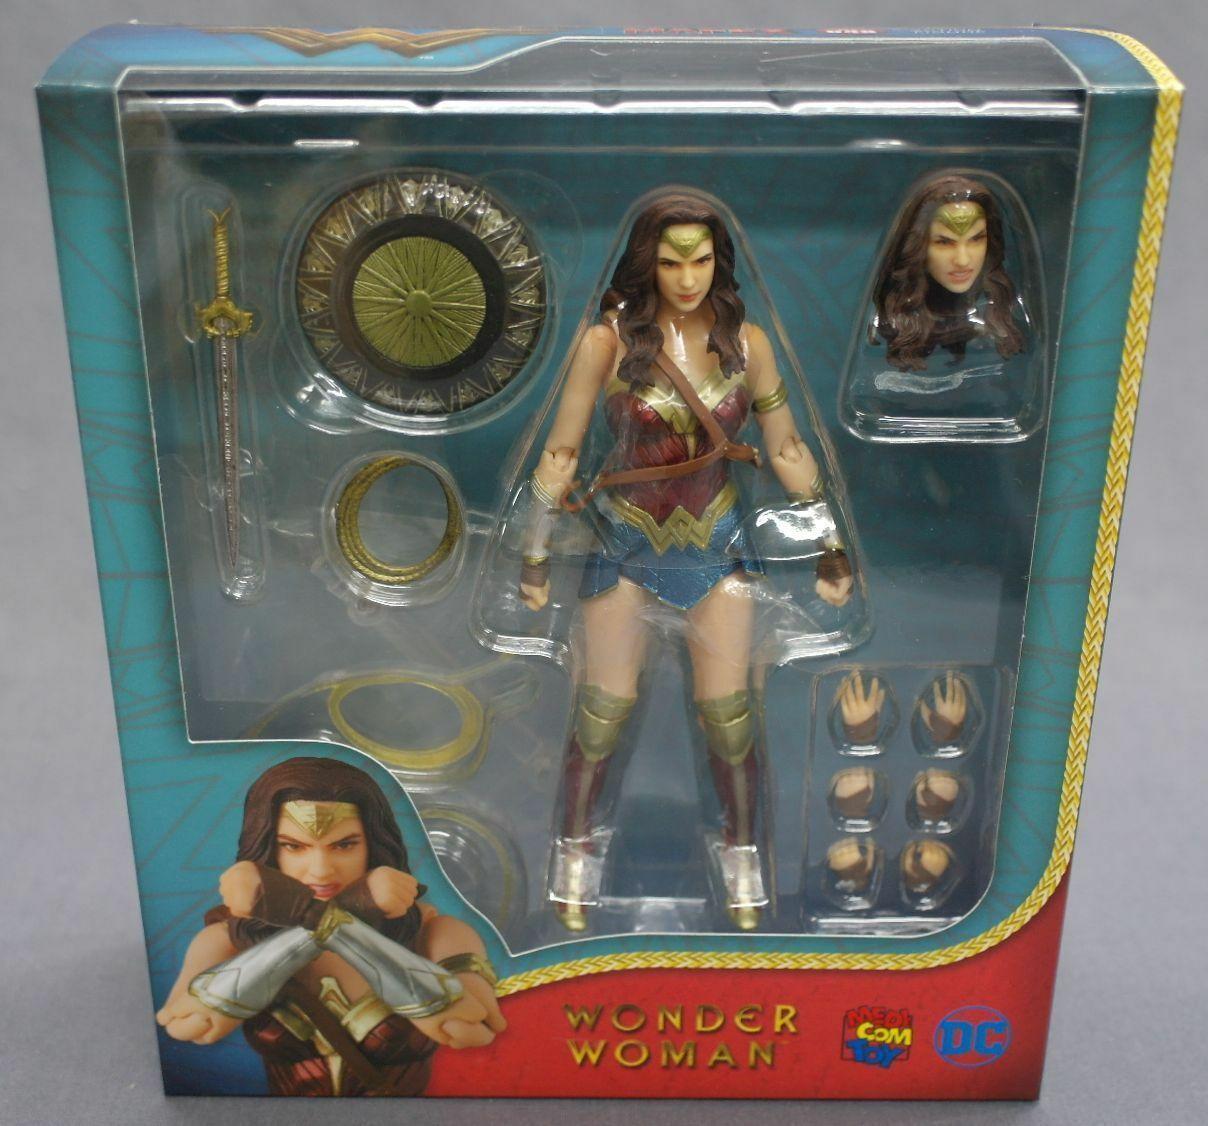 MAFEX No.048 WONDER donna Wonder donna Ver. Medicom giocattolo Japan nuovo